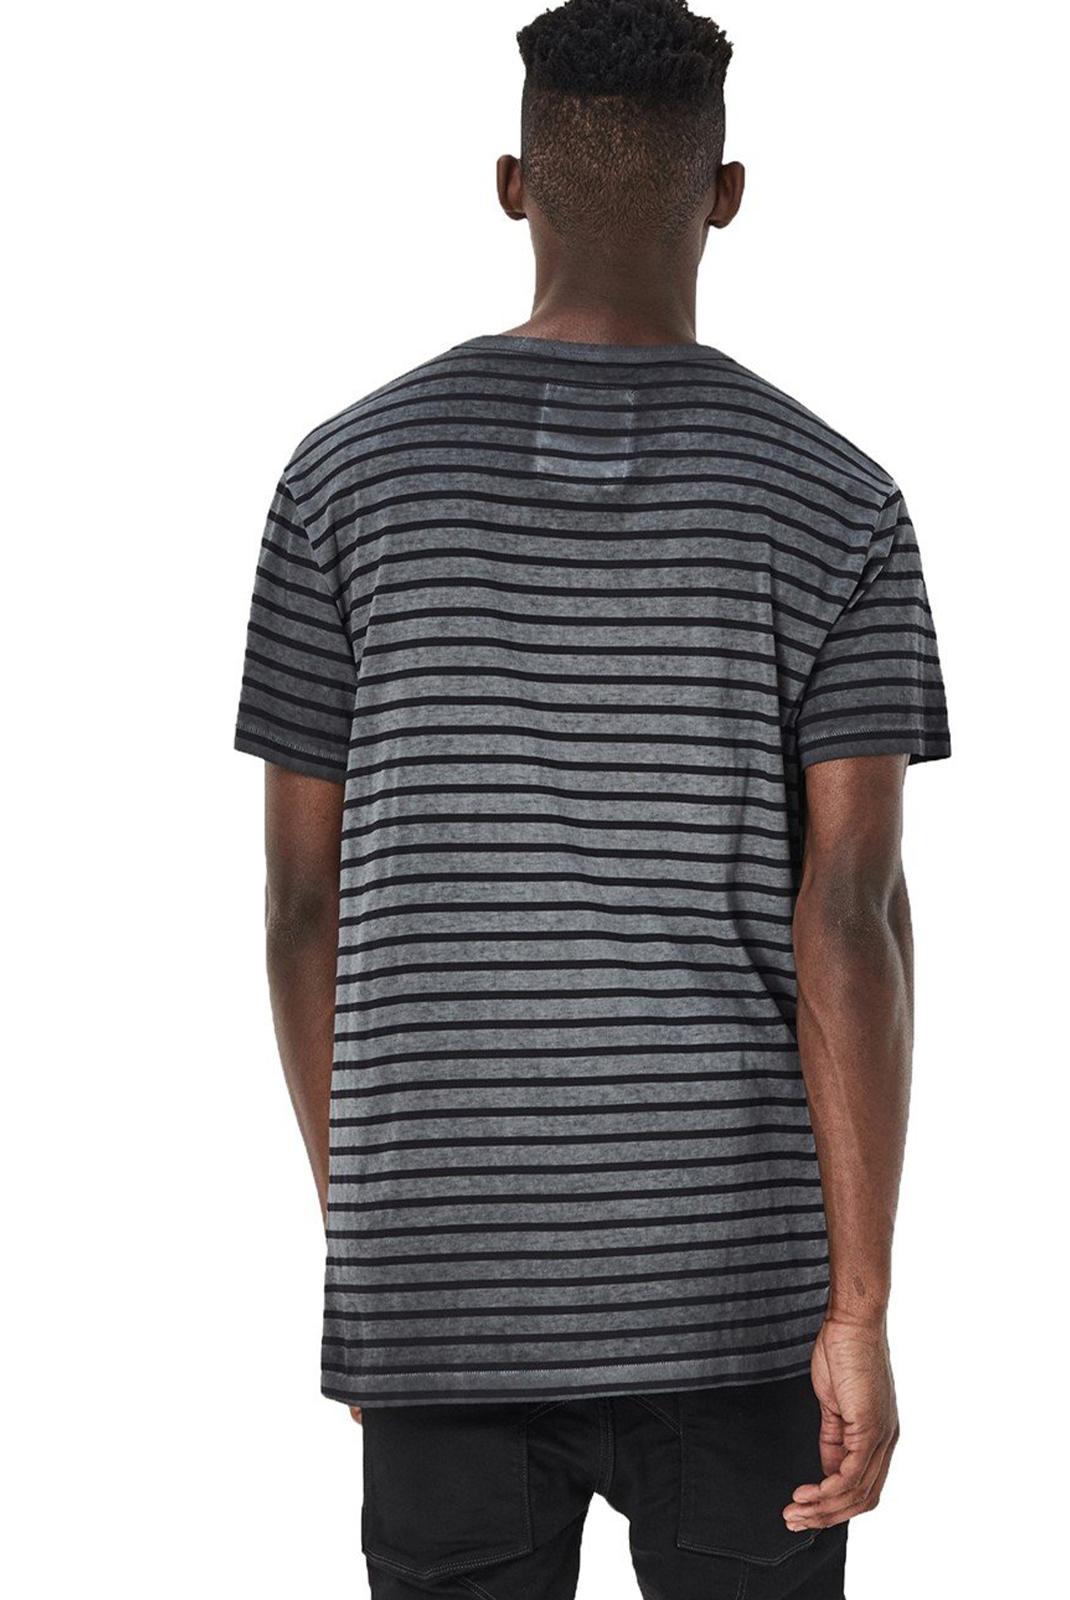 Tee-shirts  G-star D02423-8199-7065 rancis gris